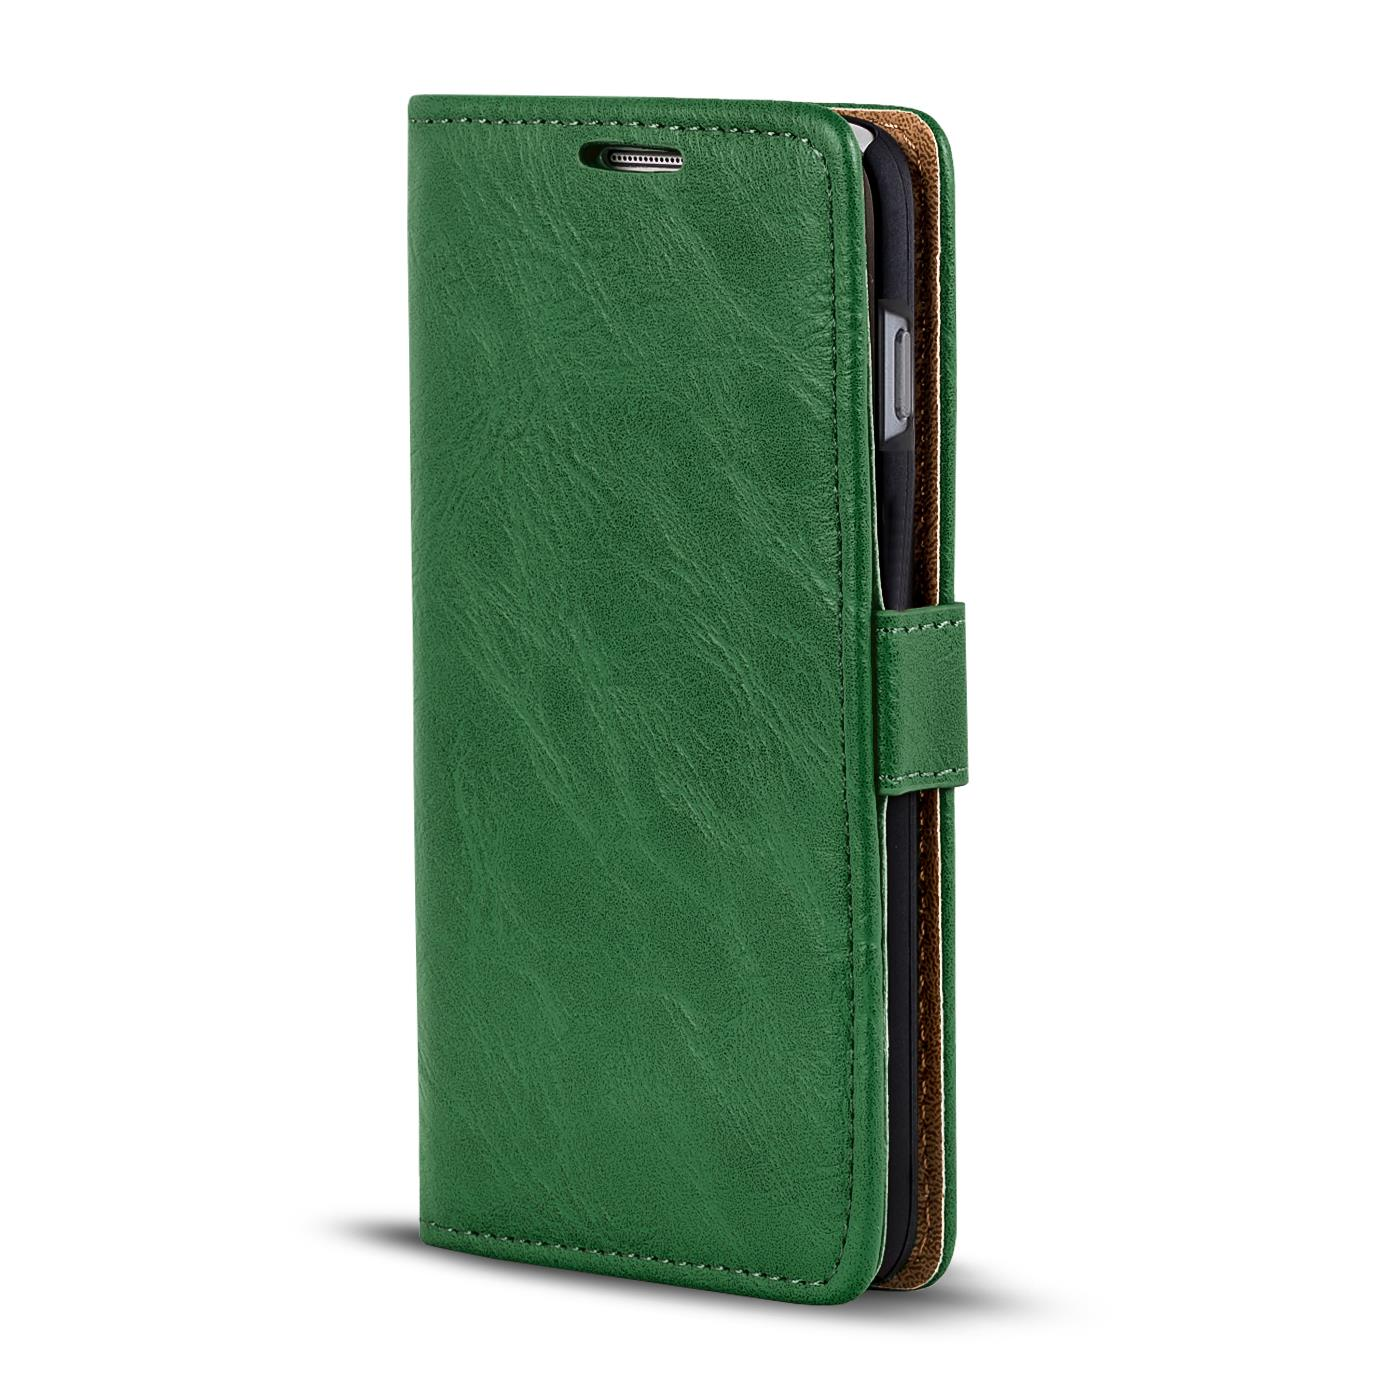 handy tasche apple iphone 7 flip cover case schutz h lle wallet premium etui ebay. Black Bedroom Furniture Sets. Home Design Ideas